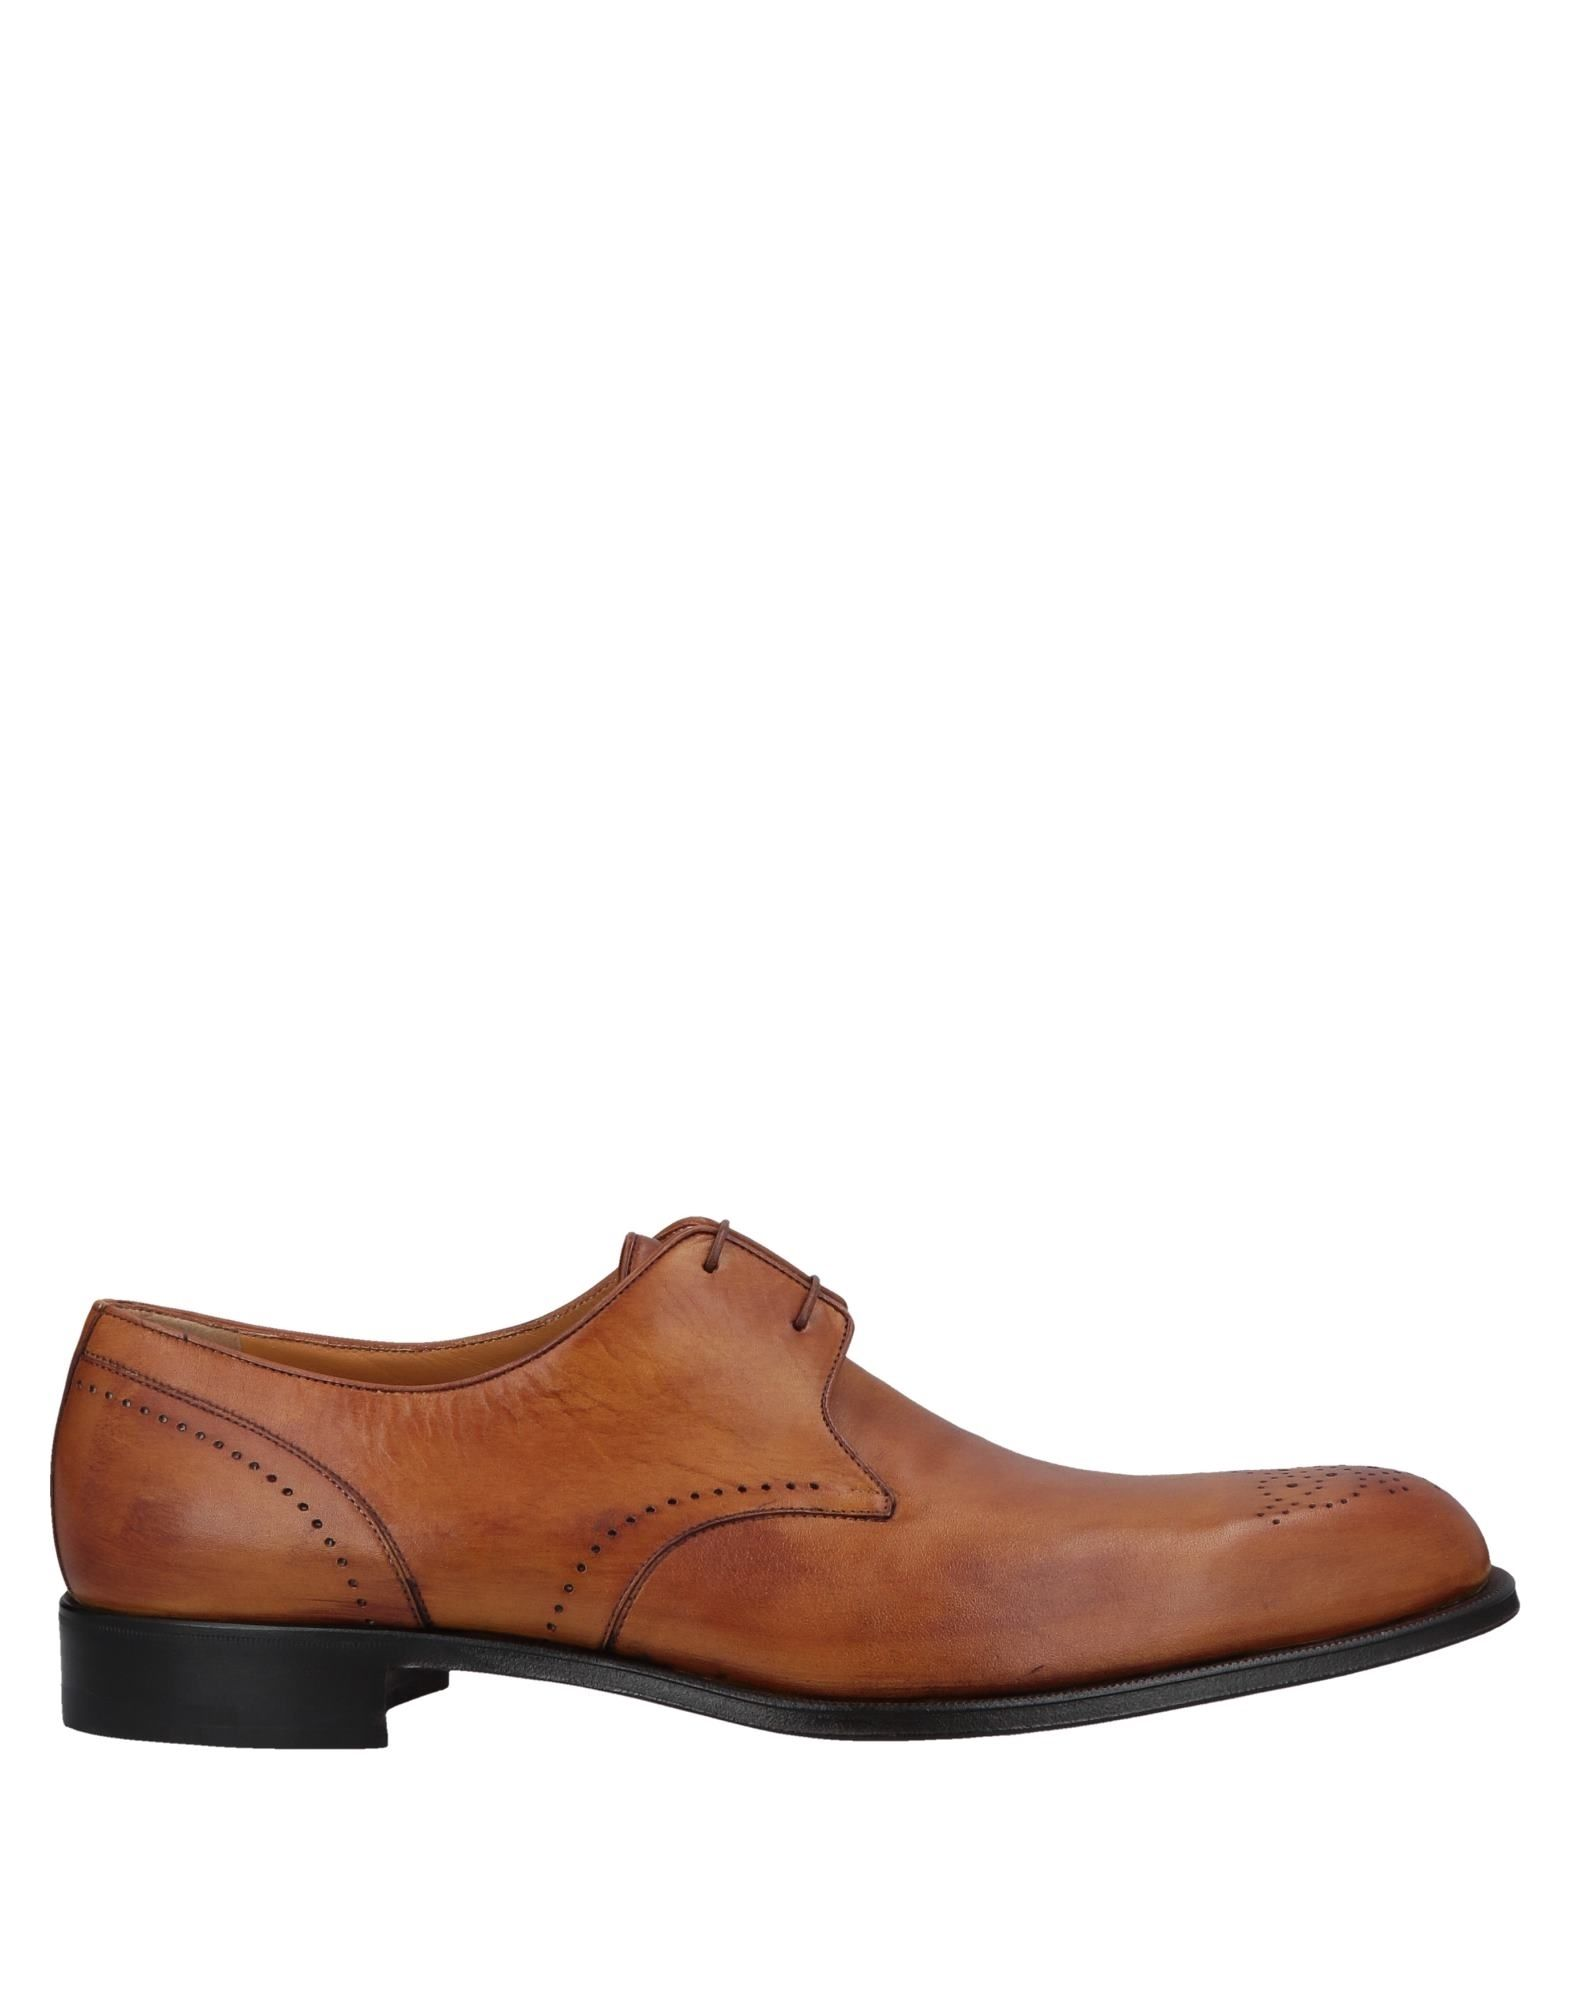 A.TESTONI Обувь на шнурках первый внутри обувь обувь обувь обувь обувь обувь обувь обувь обувь 8a2549 мужская армия green 40 метров